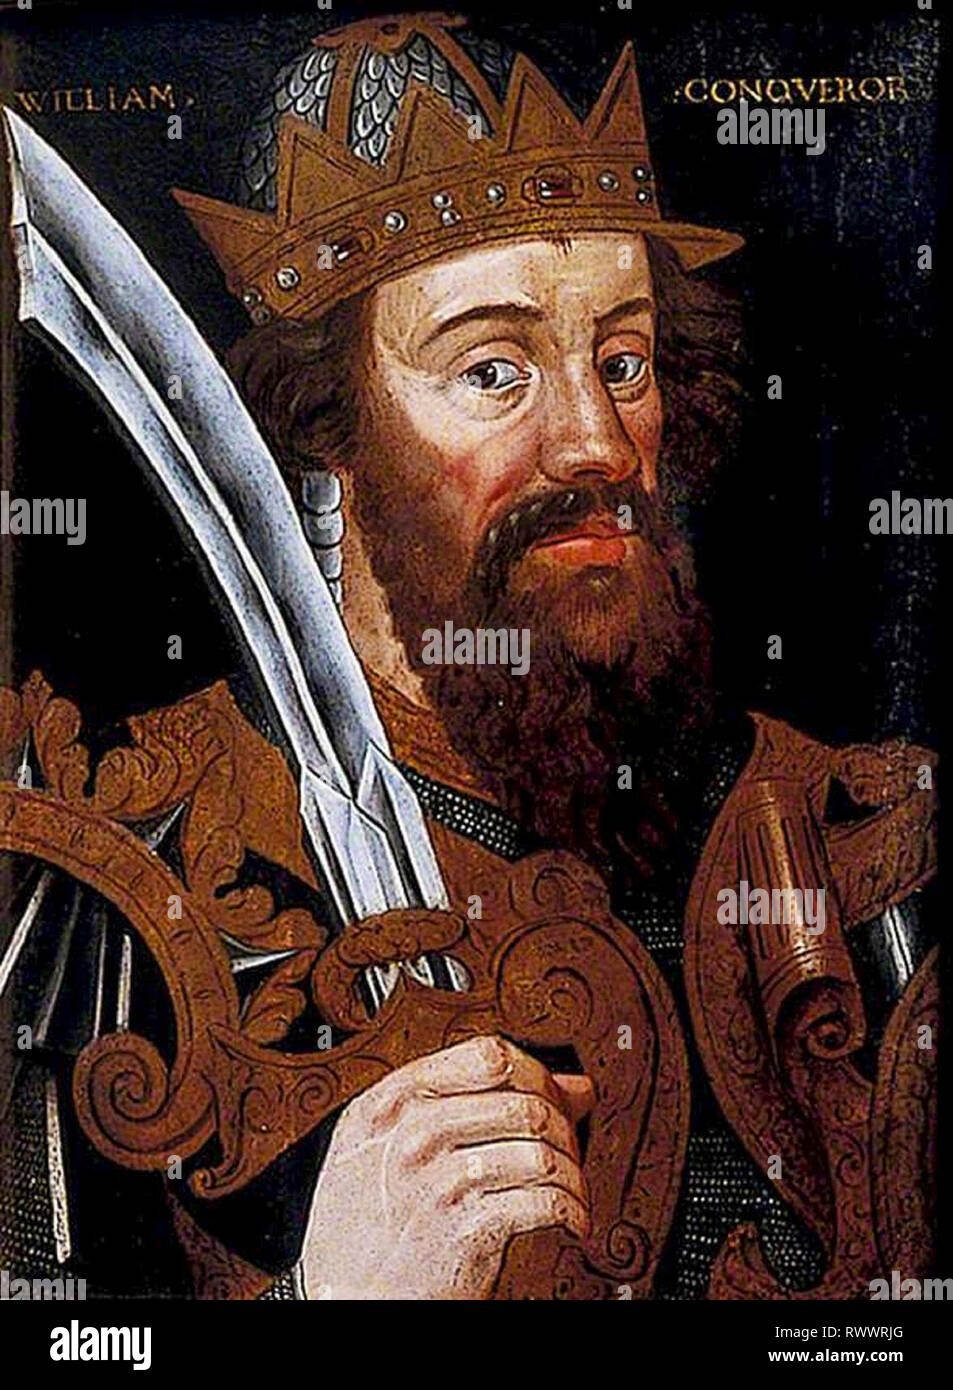 William the Conqueror (c. 1028-1087) portrait painting, original version of the popular 1620 painting, unknown artist, c. 1580 - Stock Image